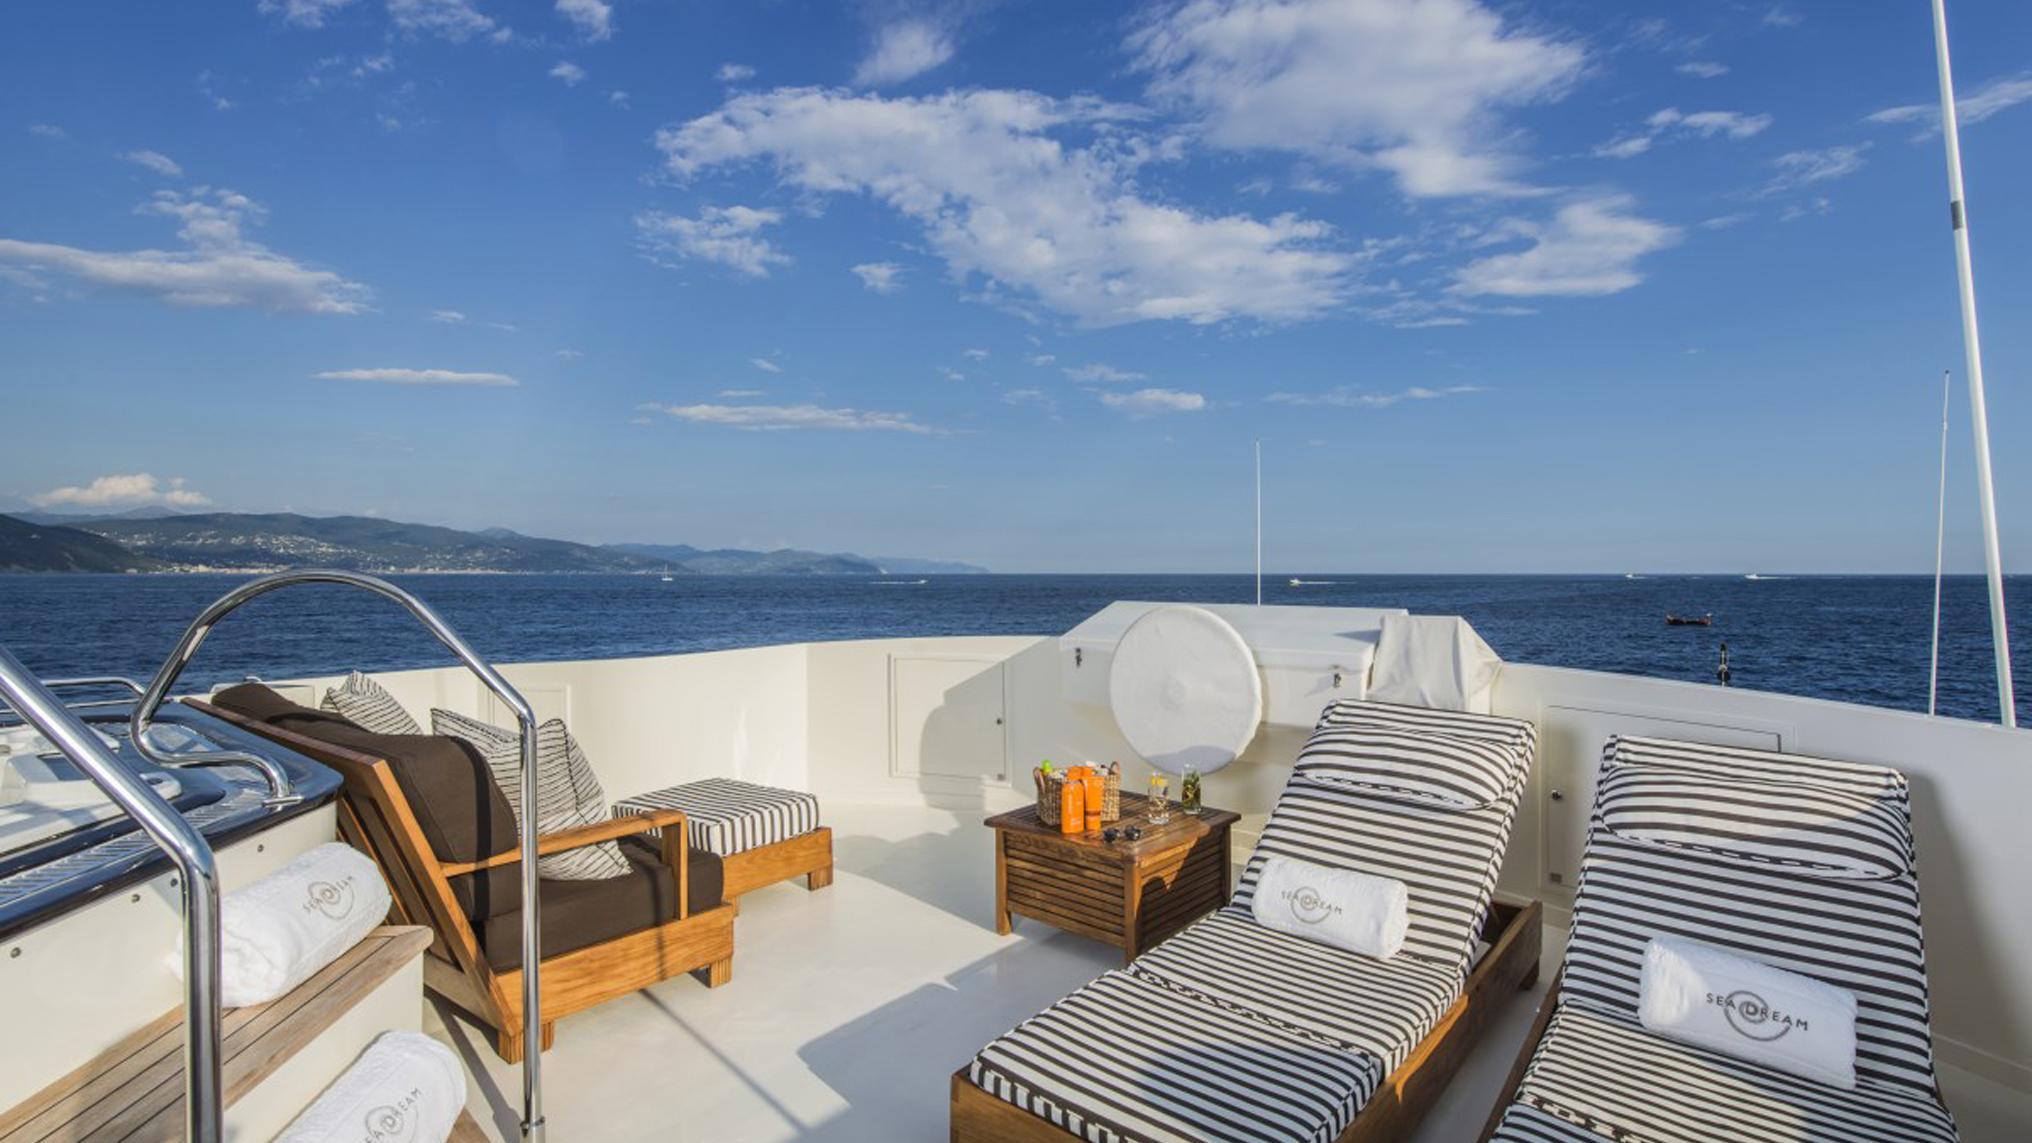 sea-dream-yacht-sun-deck